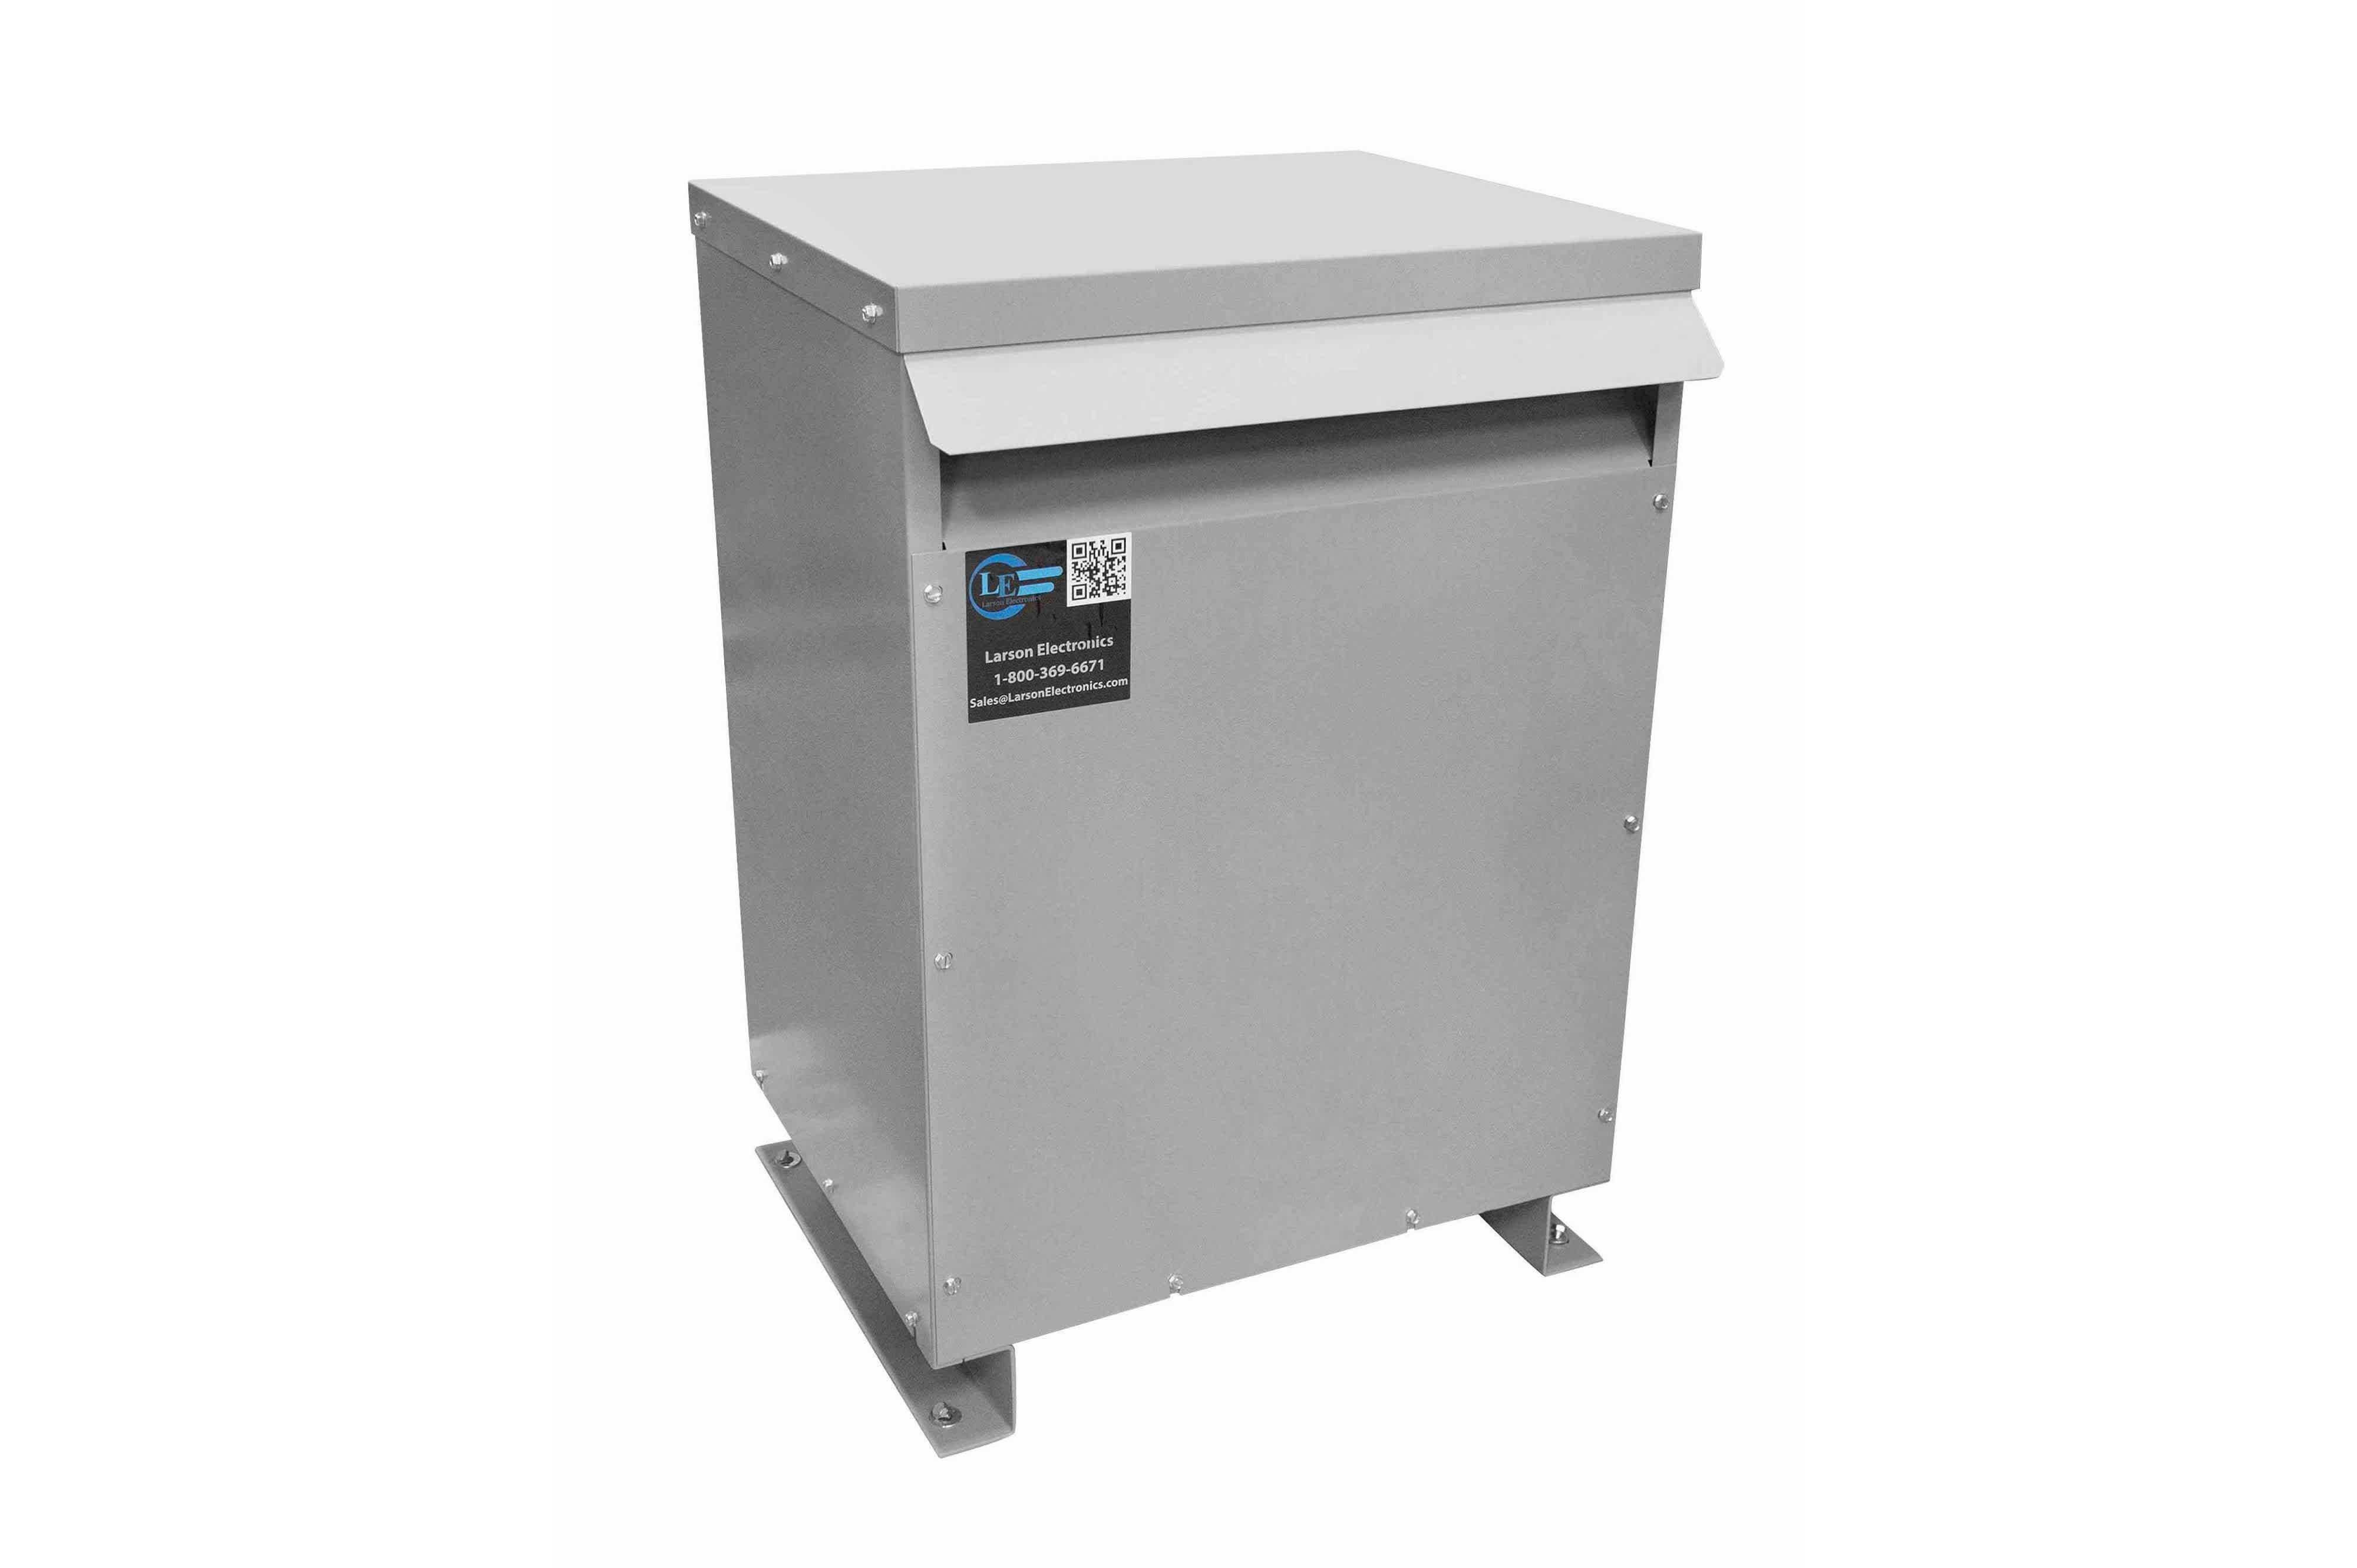 75 kVA 3PH Isolation Transformer, 230V Wye Primary, 208Y/120 Wye-N Secondary, N3R, Ventilated, 60 Hz